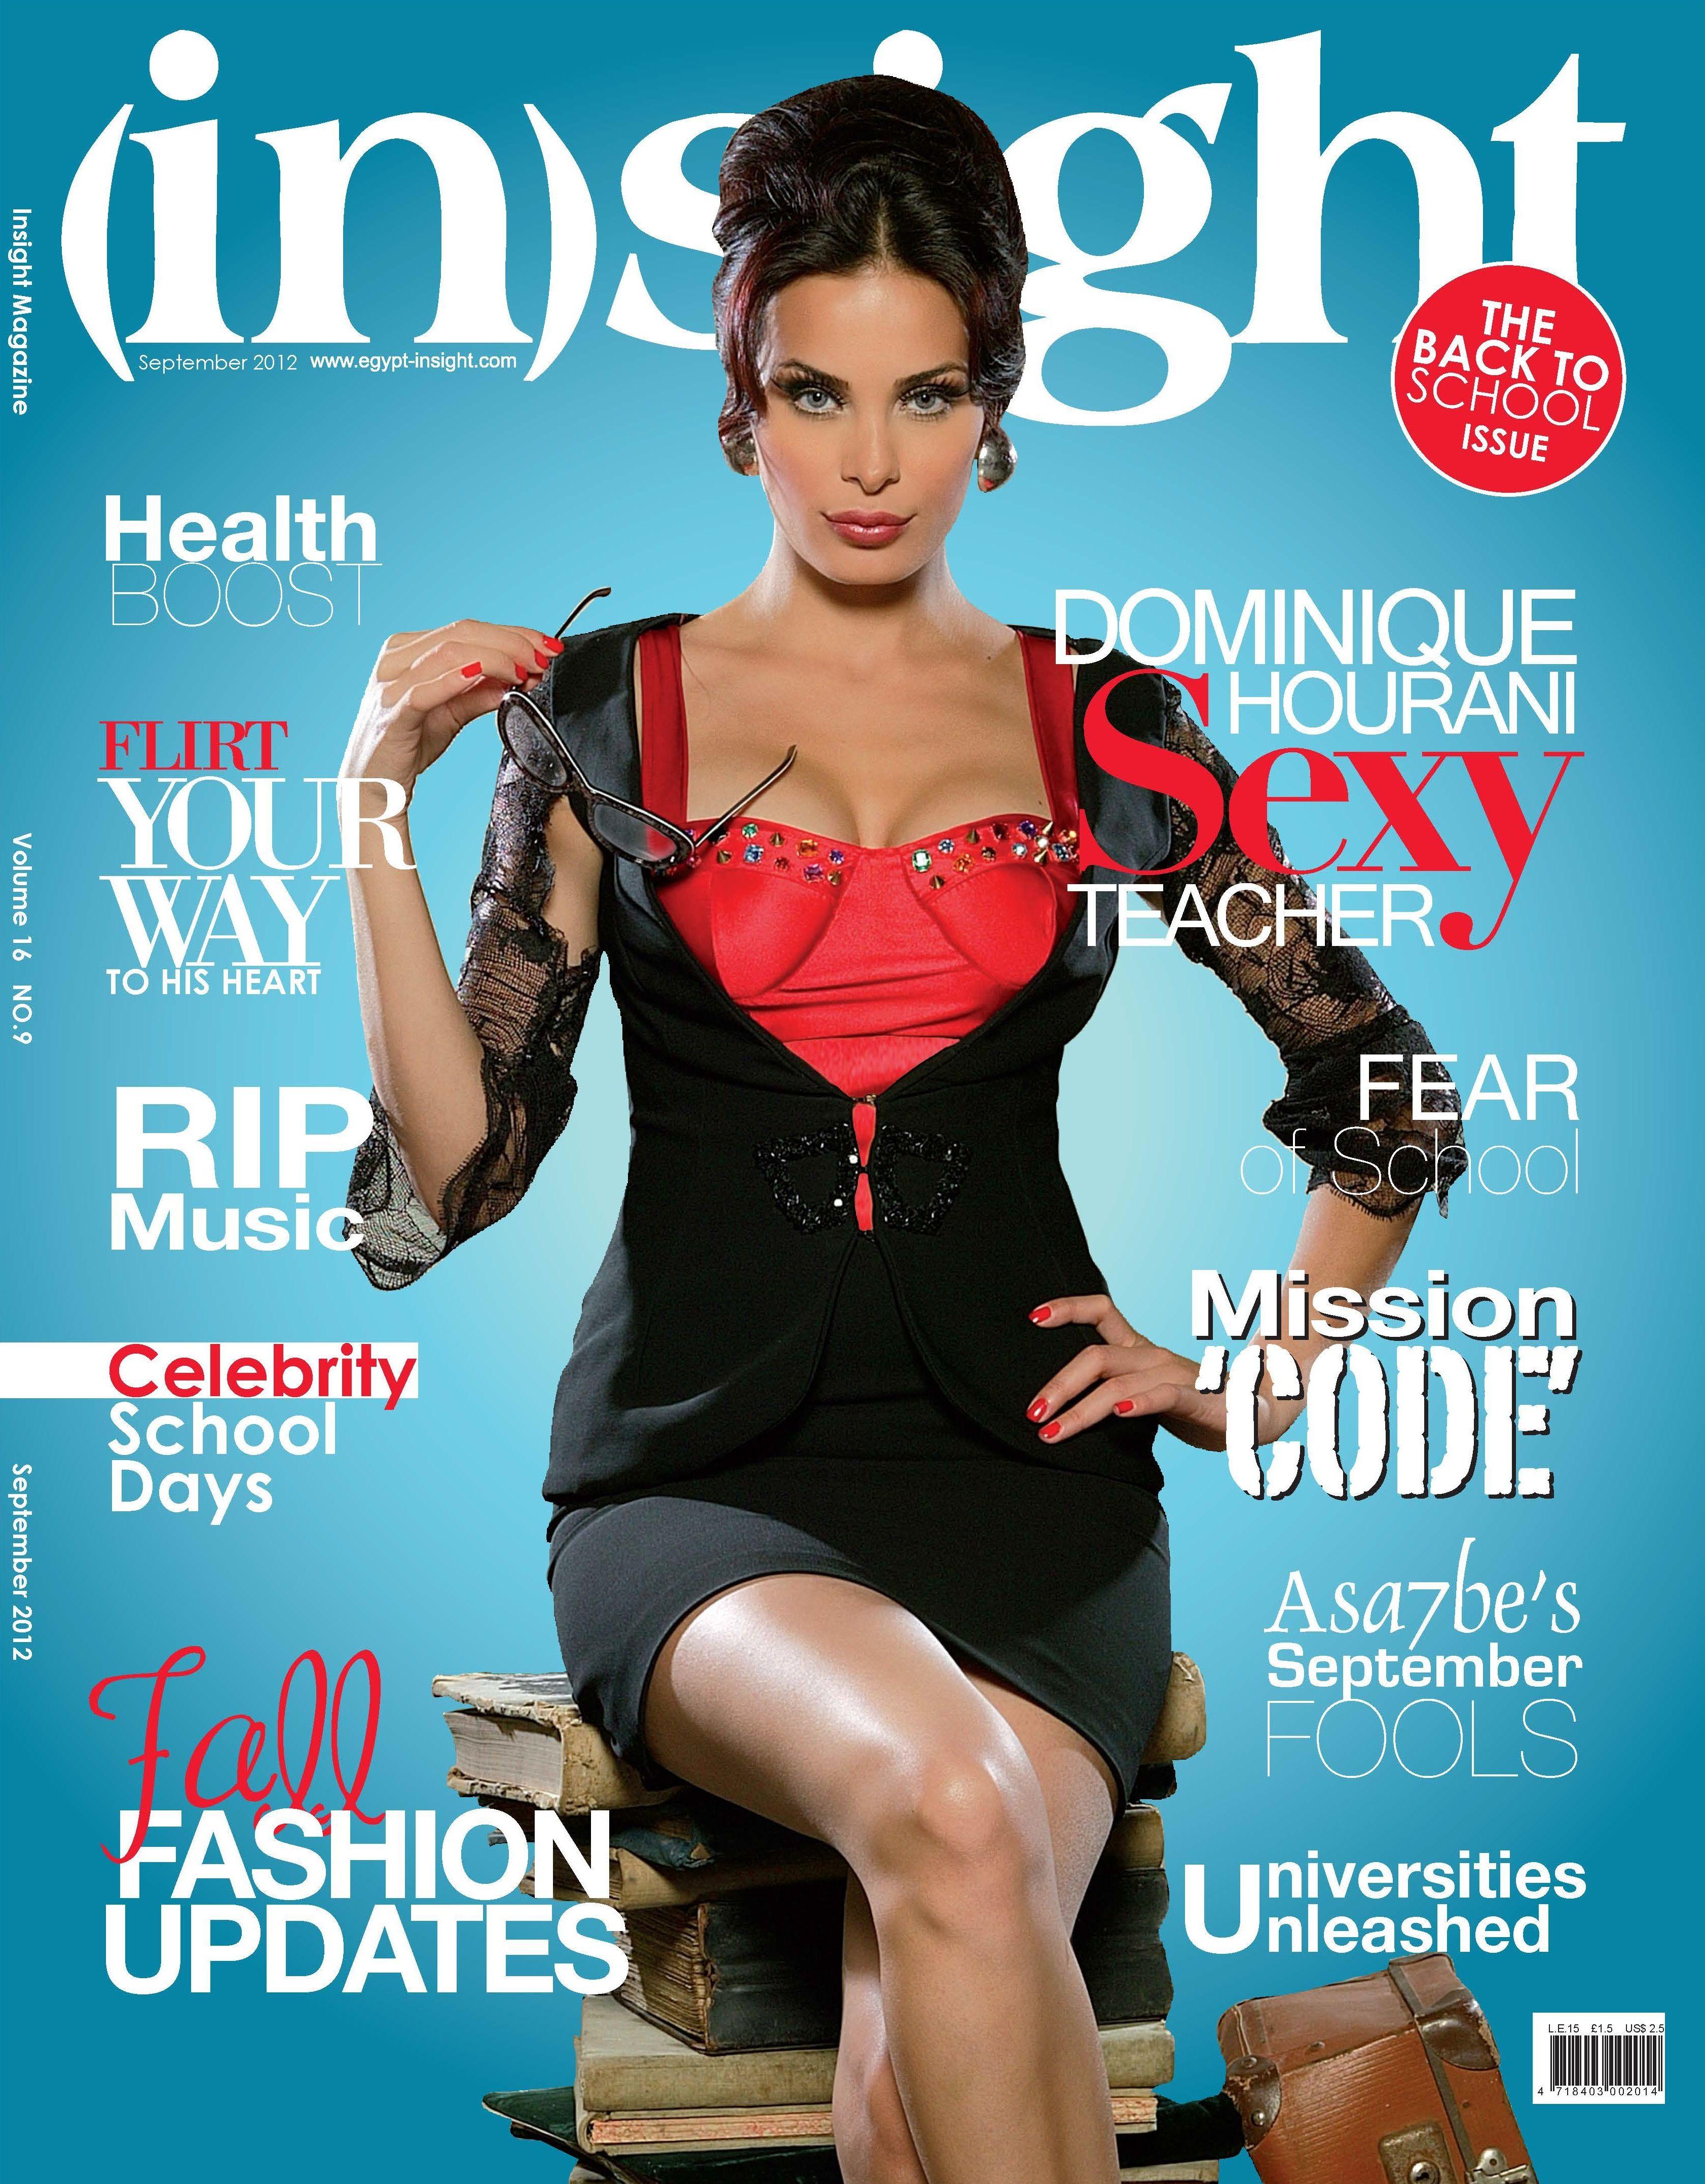 Insight Magazine September fashion, Coding school, Flirting